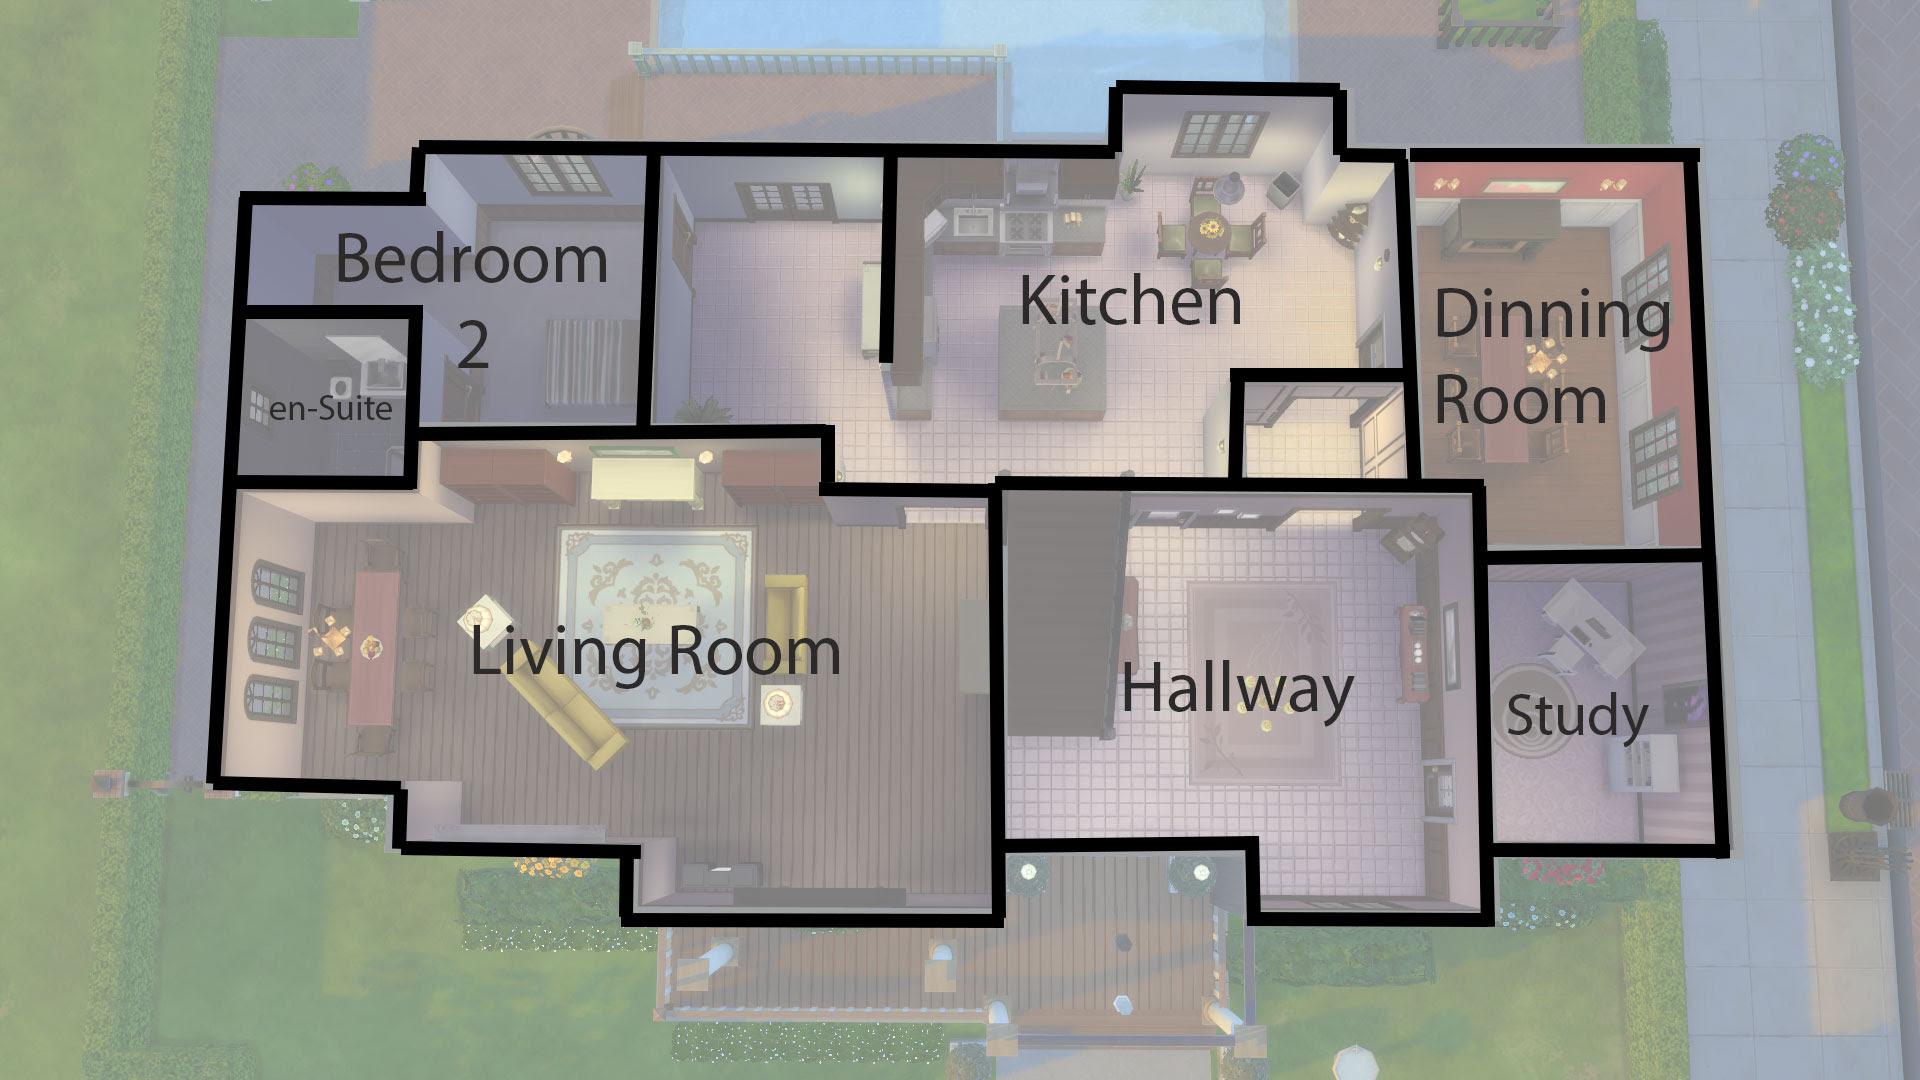 The Sims 4 Simple House Design Modern Design